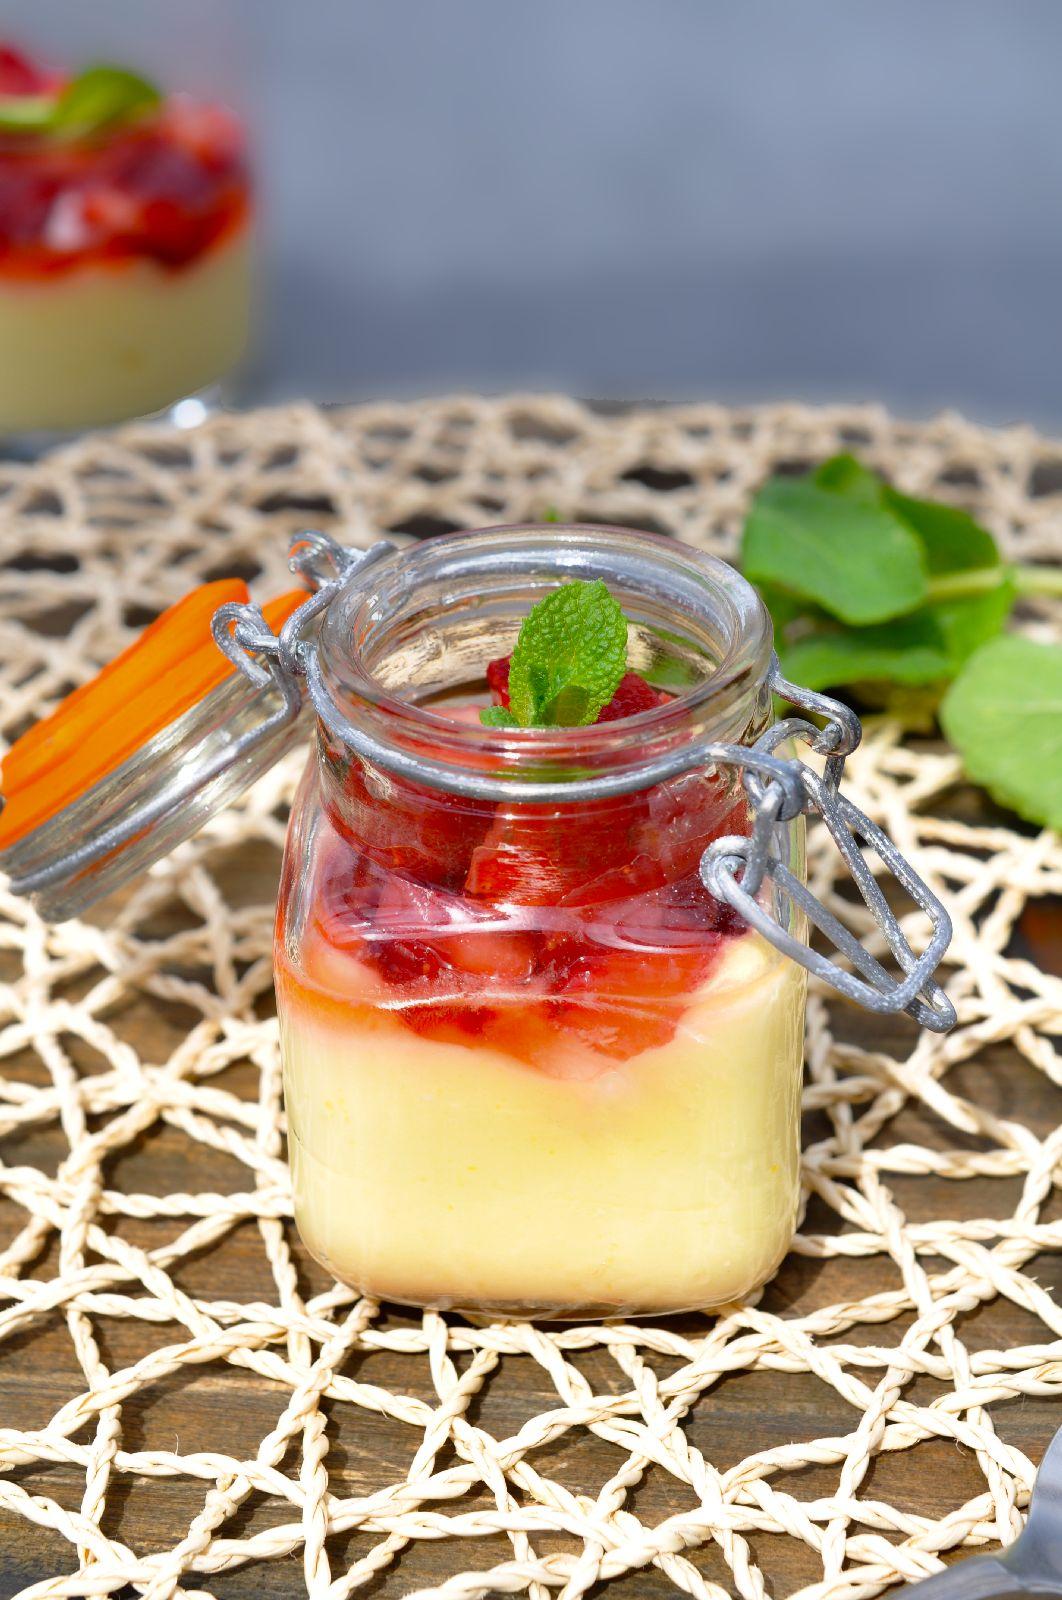 Limonina krema z jagodami3_web